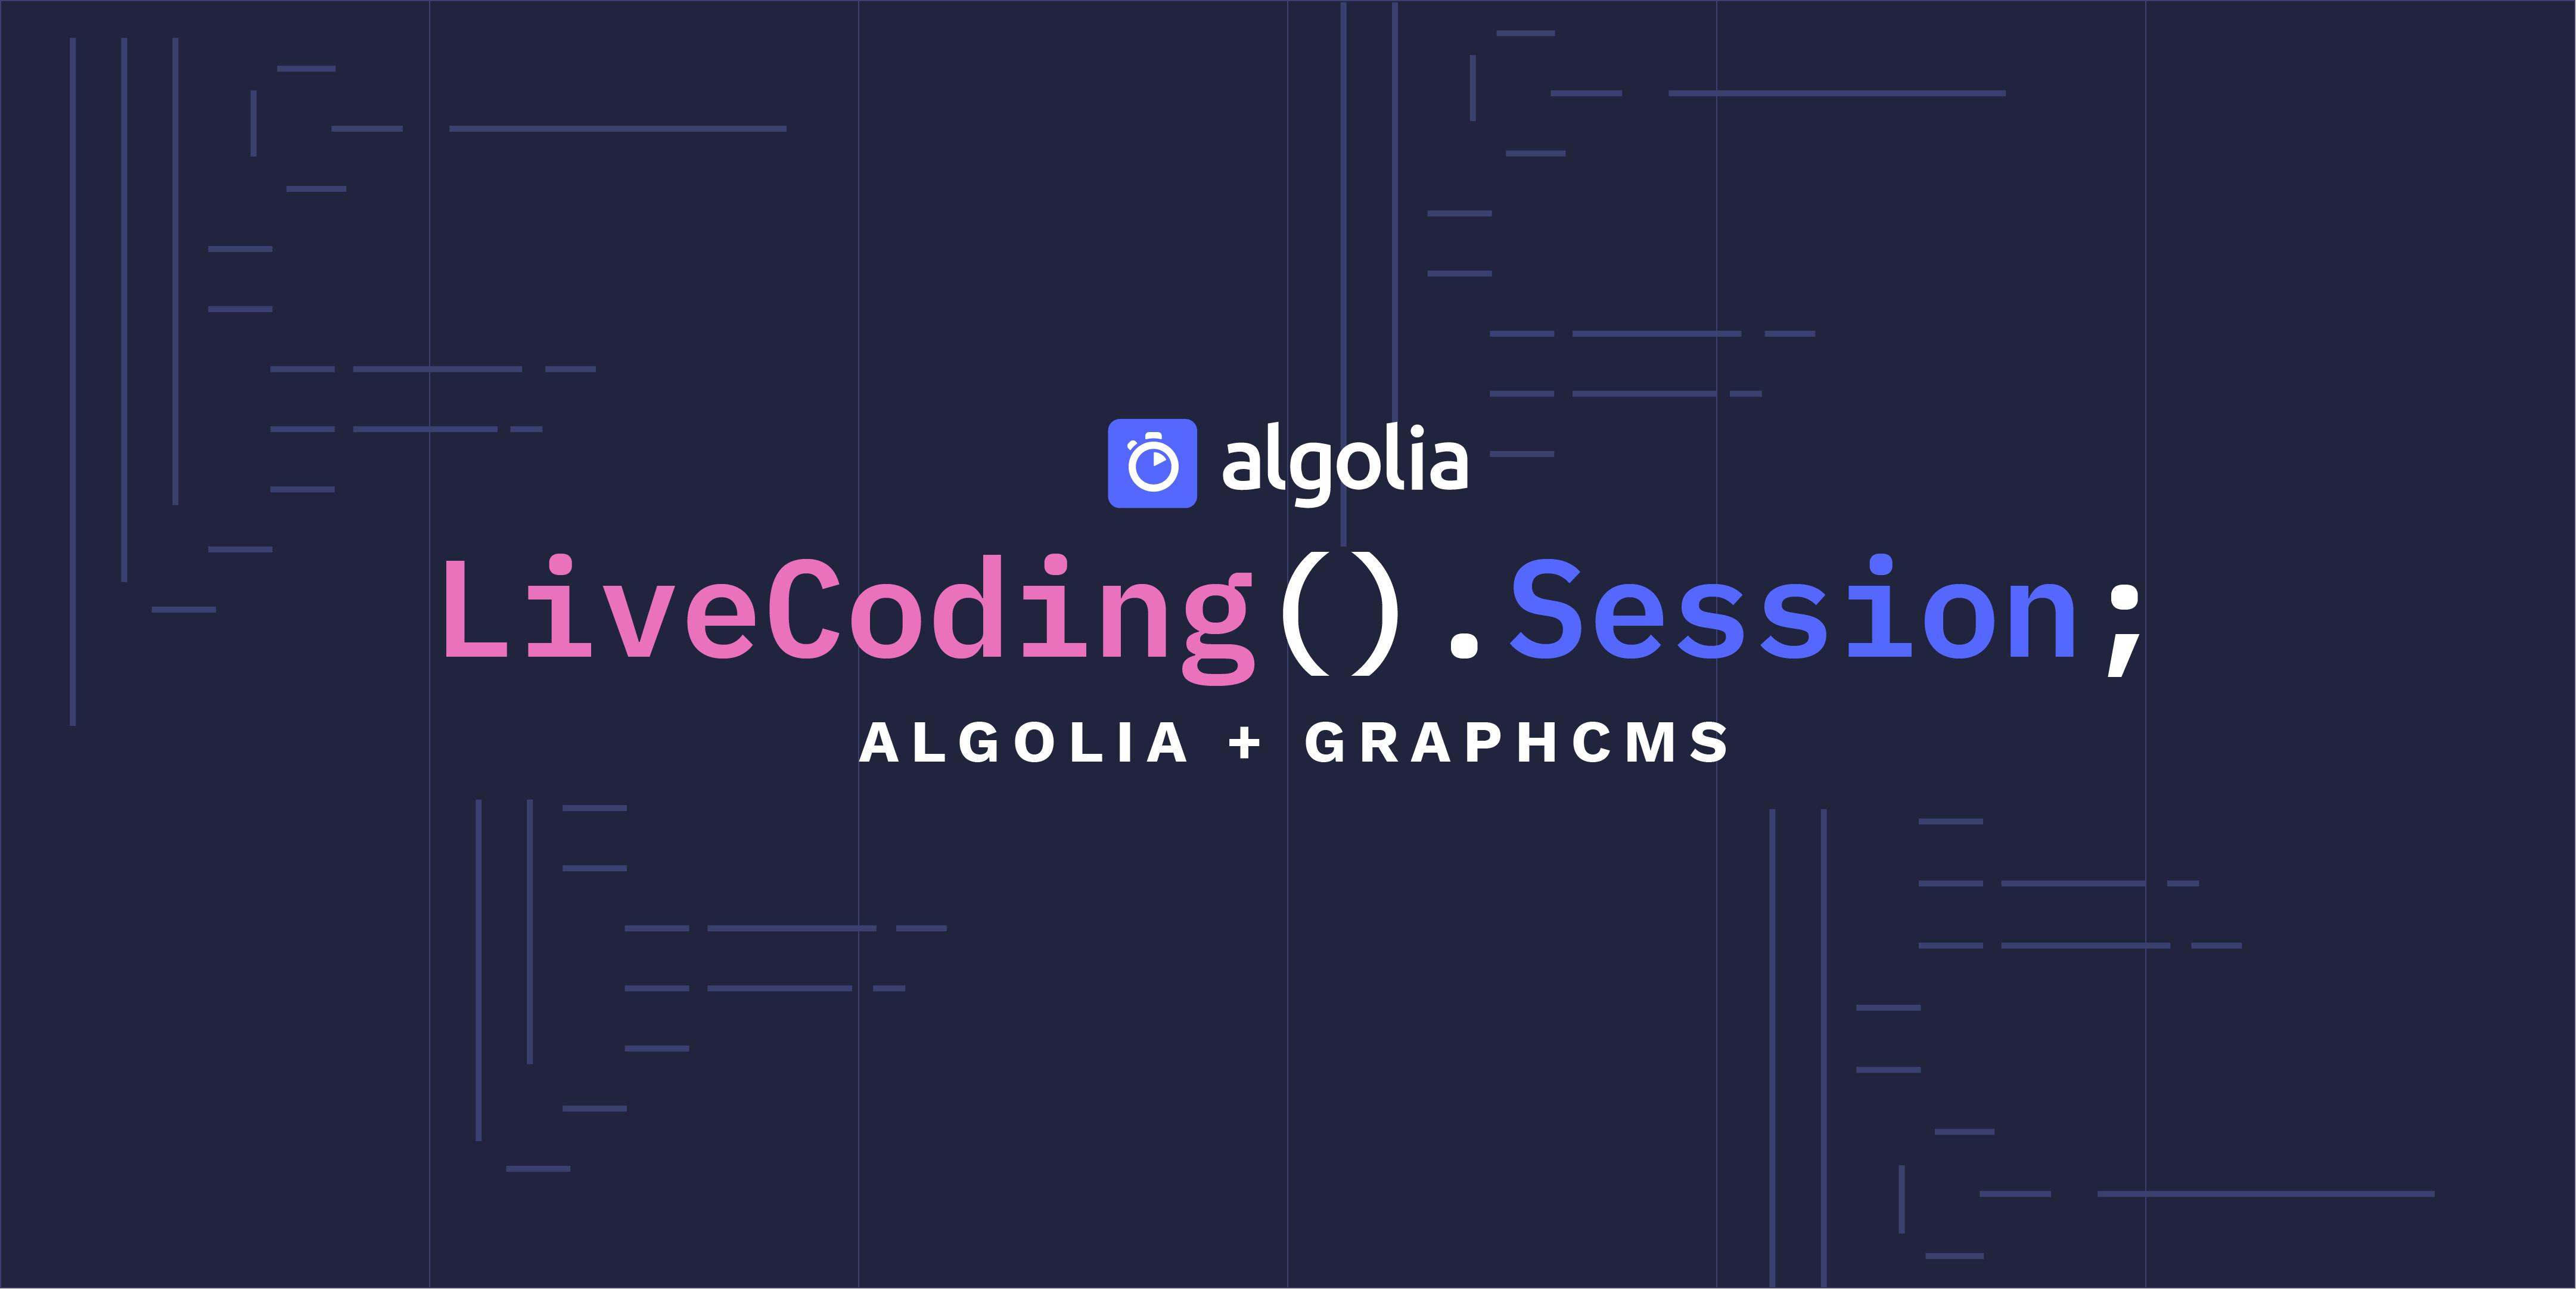 "illustration for: 'LiveCoding Session: Algolia + GraphCMS'"""